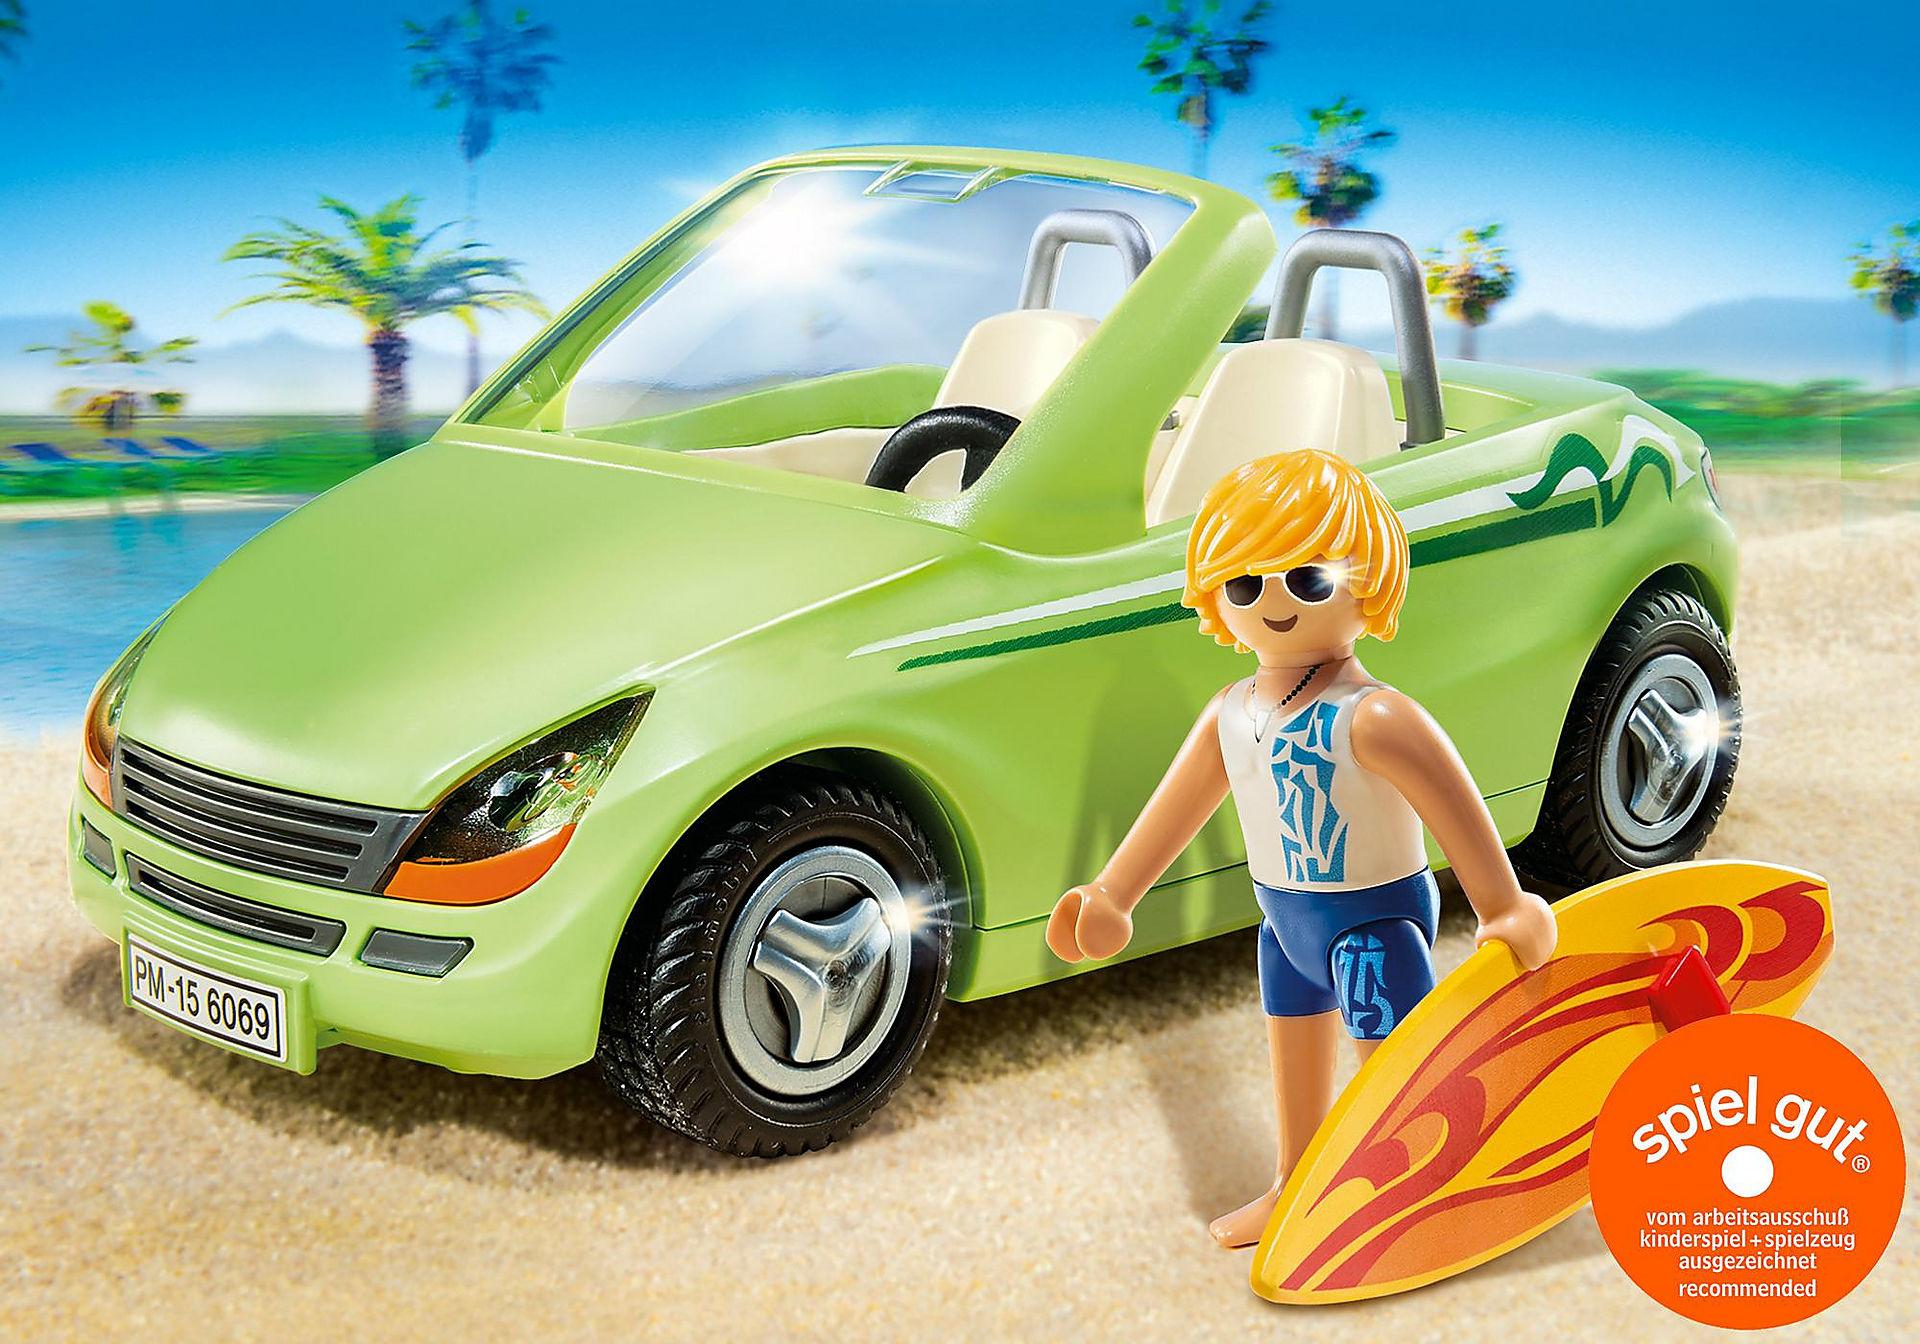 http://media.playmobil.com/i/playmobil/6069_product_detail/Surf-Roadster